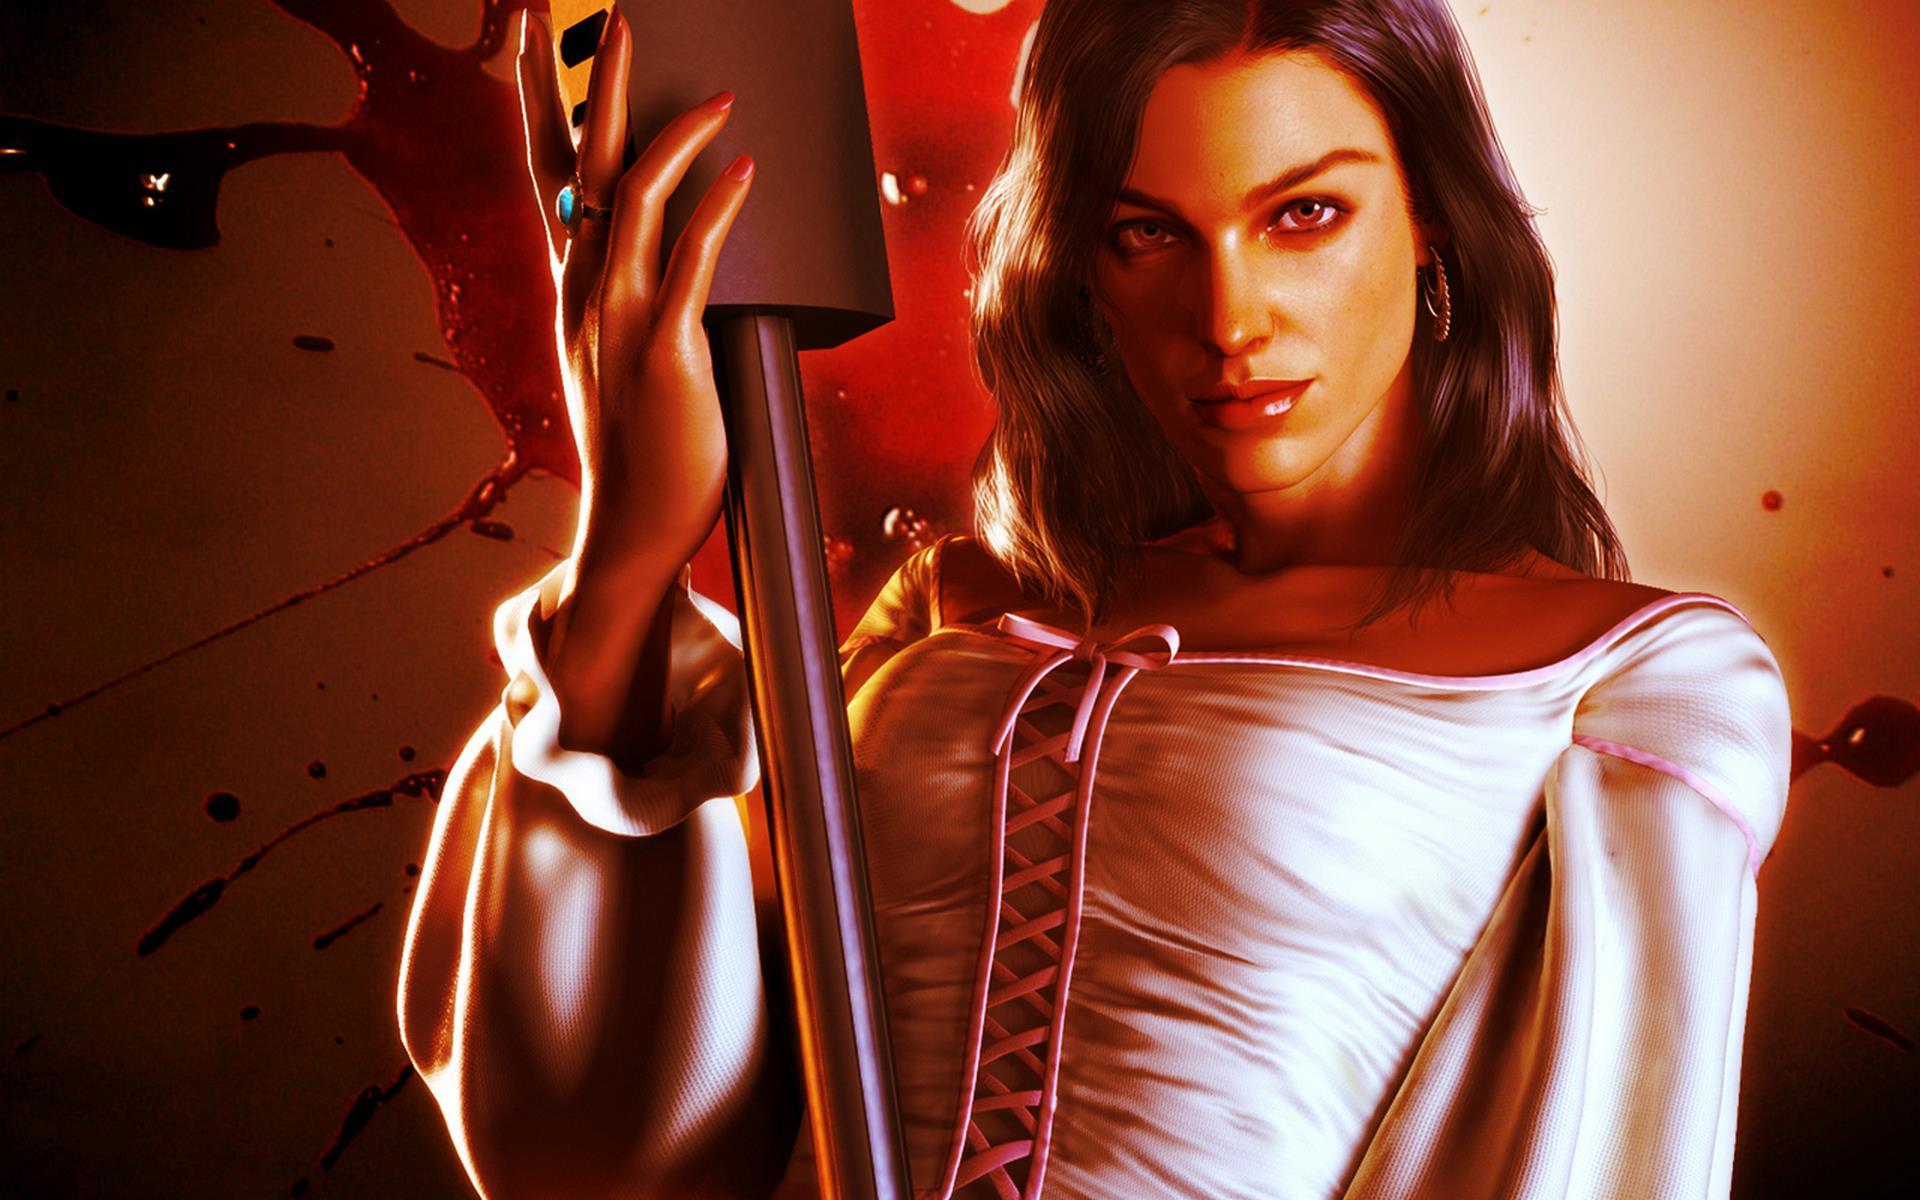 sexy_etrange_mystique_filles-HD_03